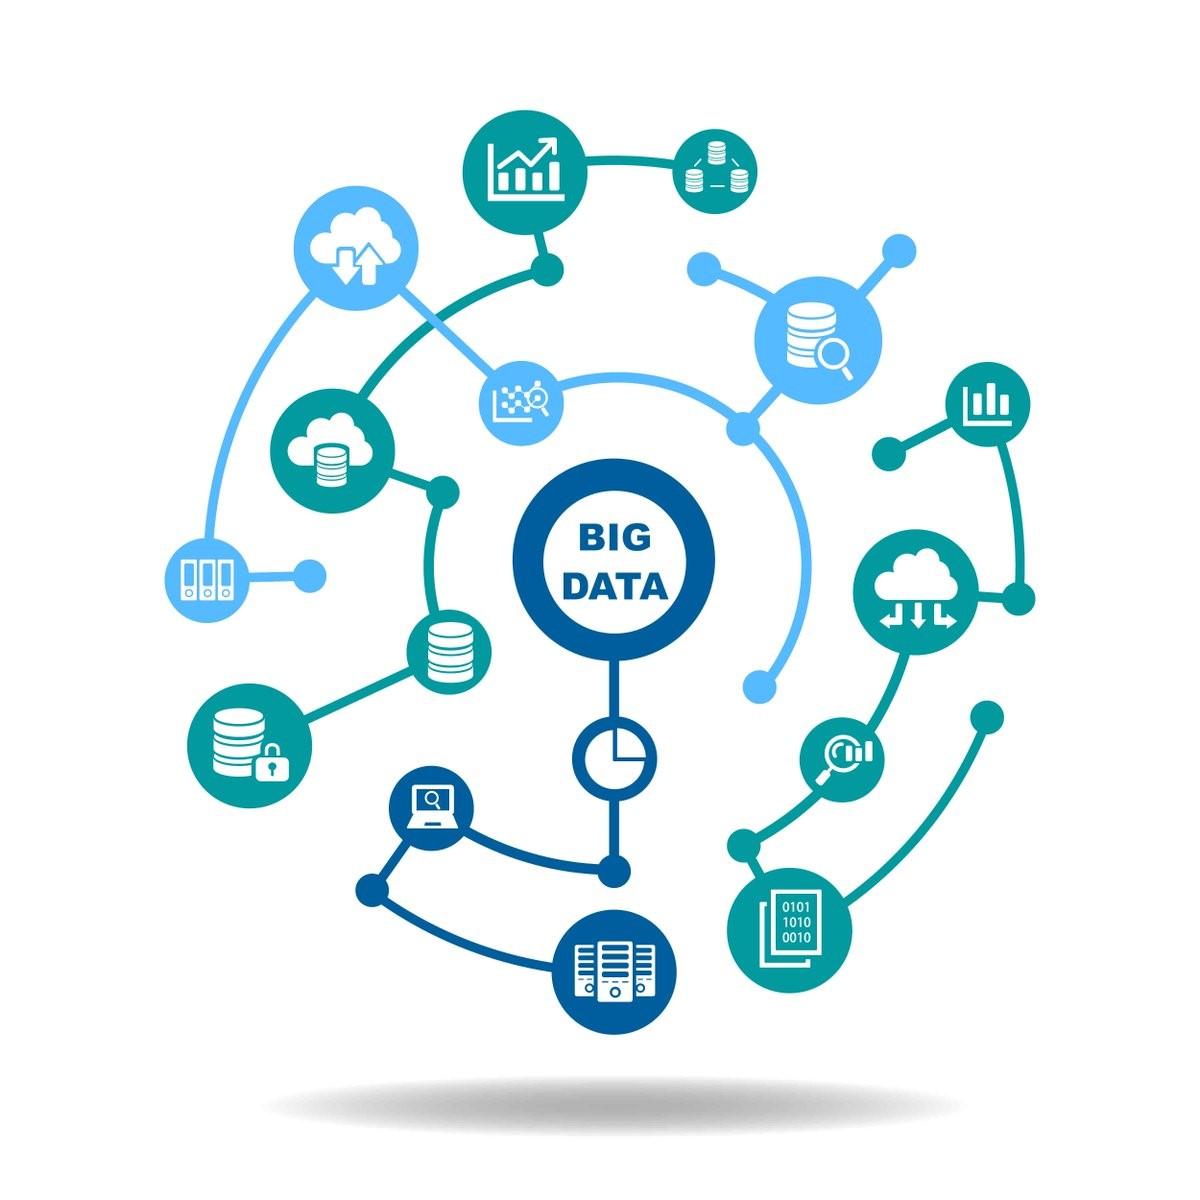 big data expertise